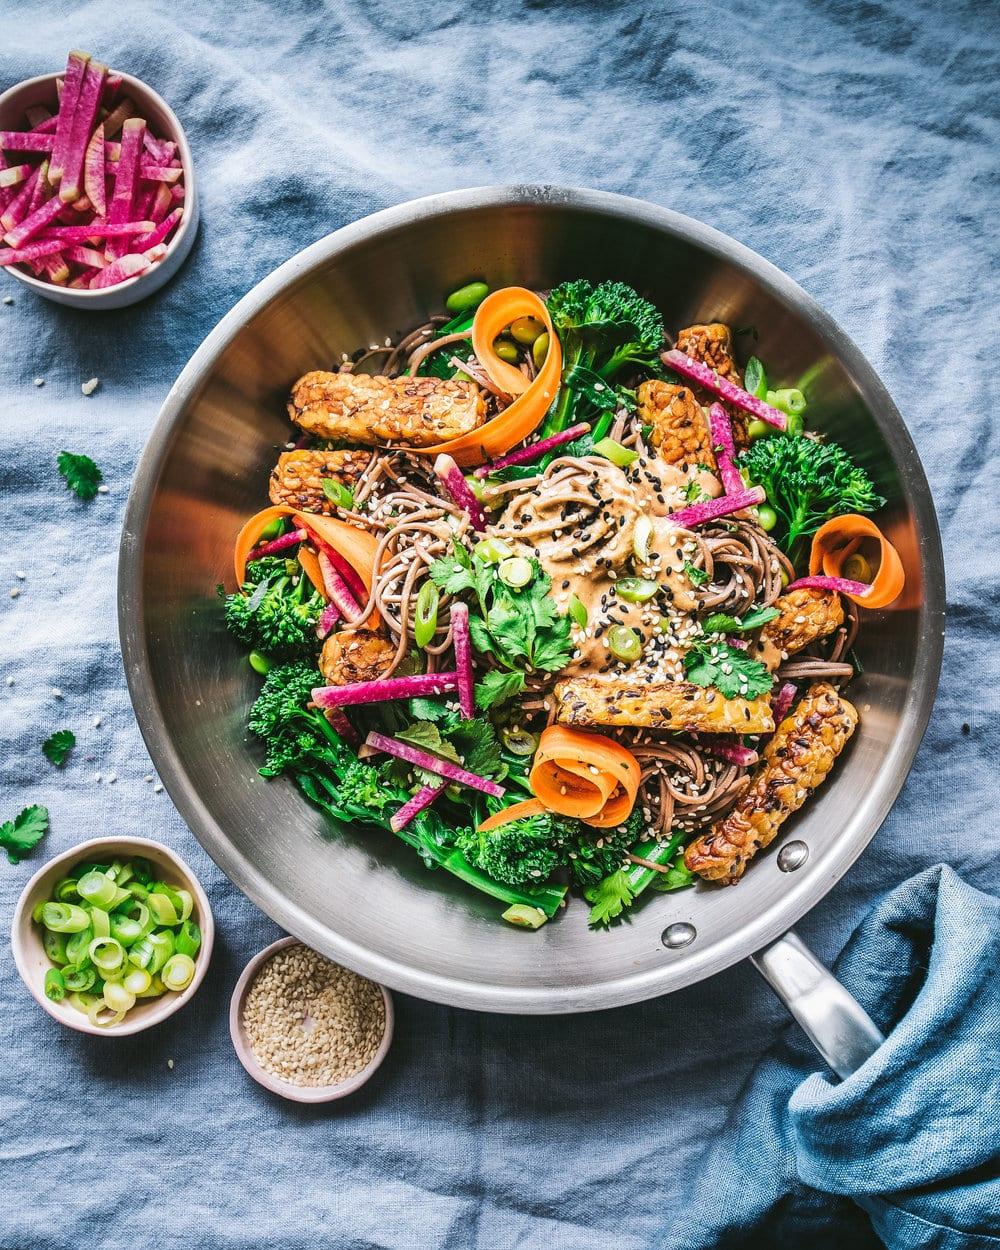 Spicy Sesame-Cashew Noodle Salad